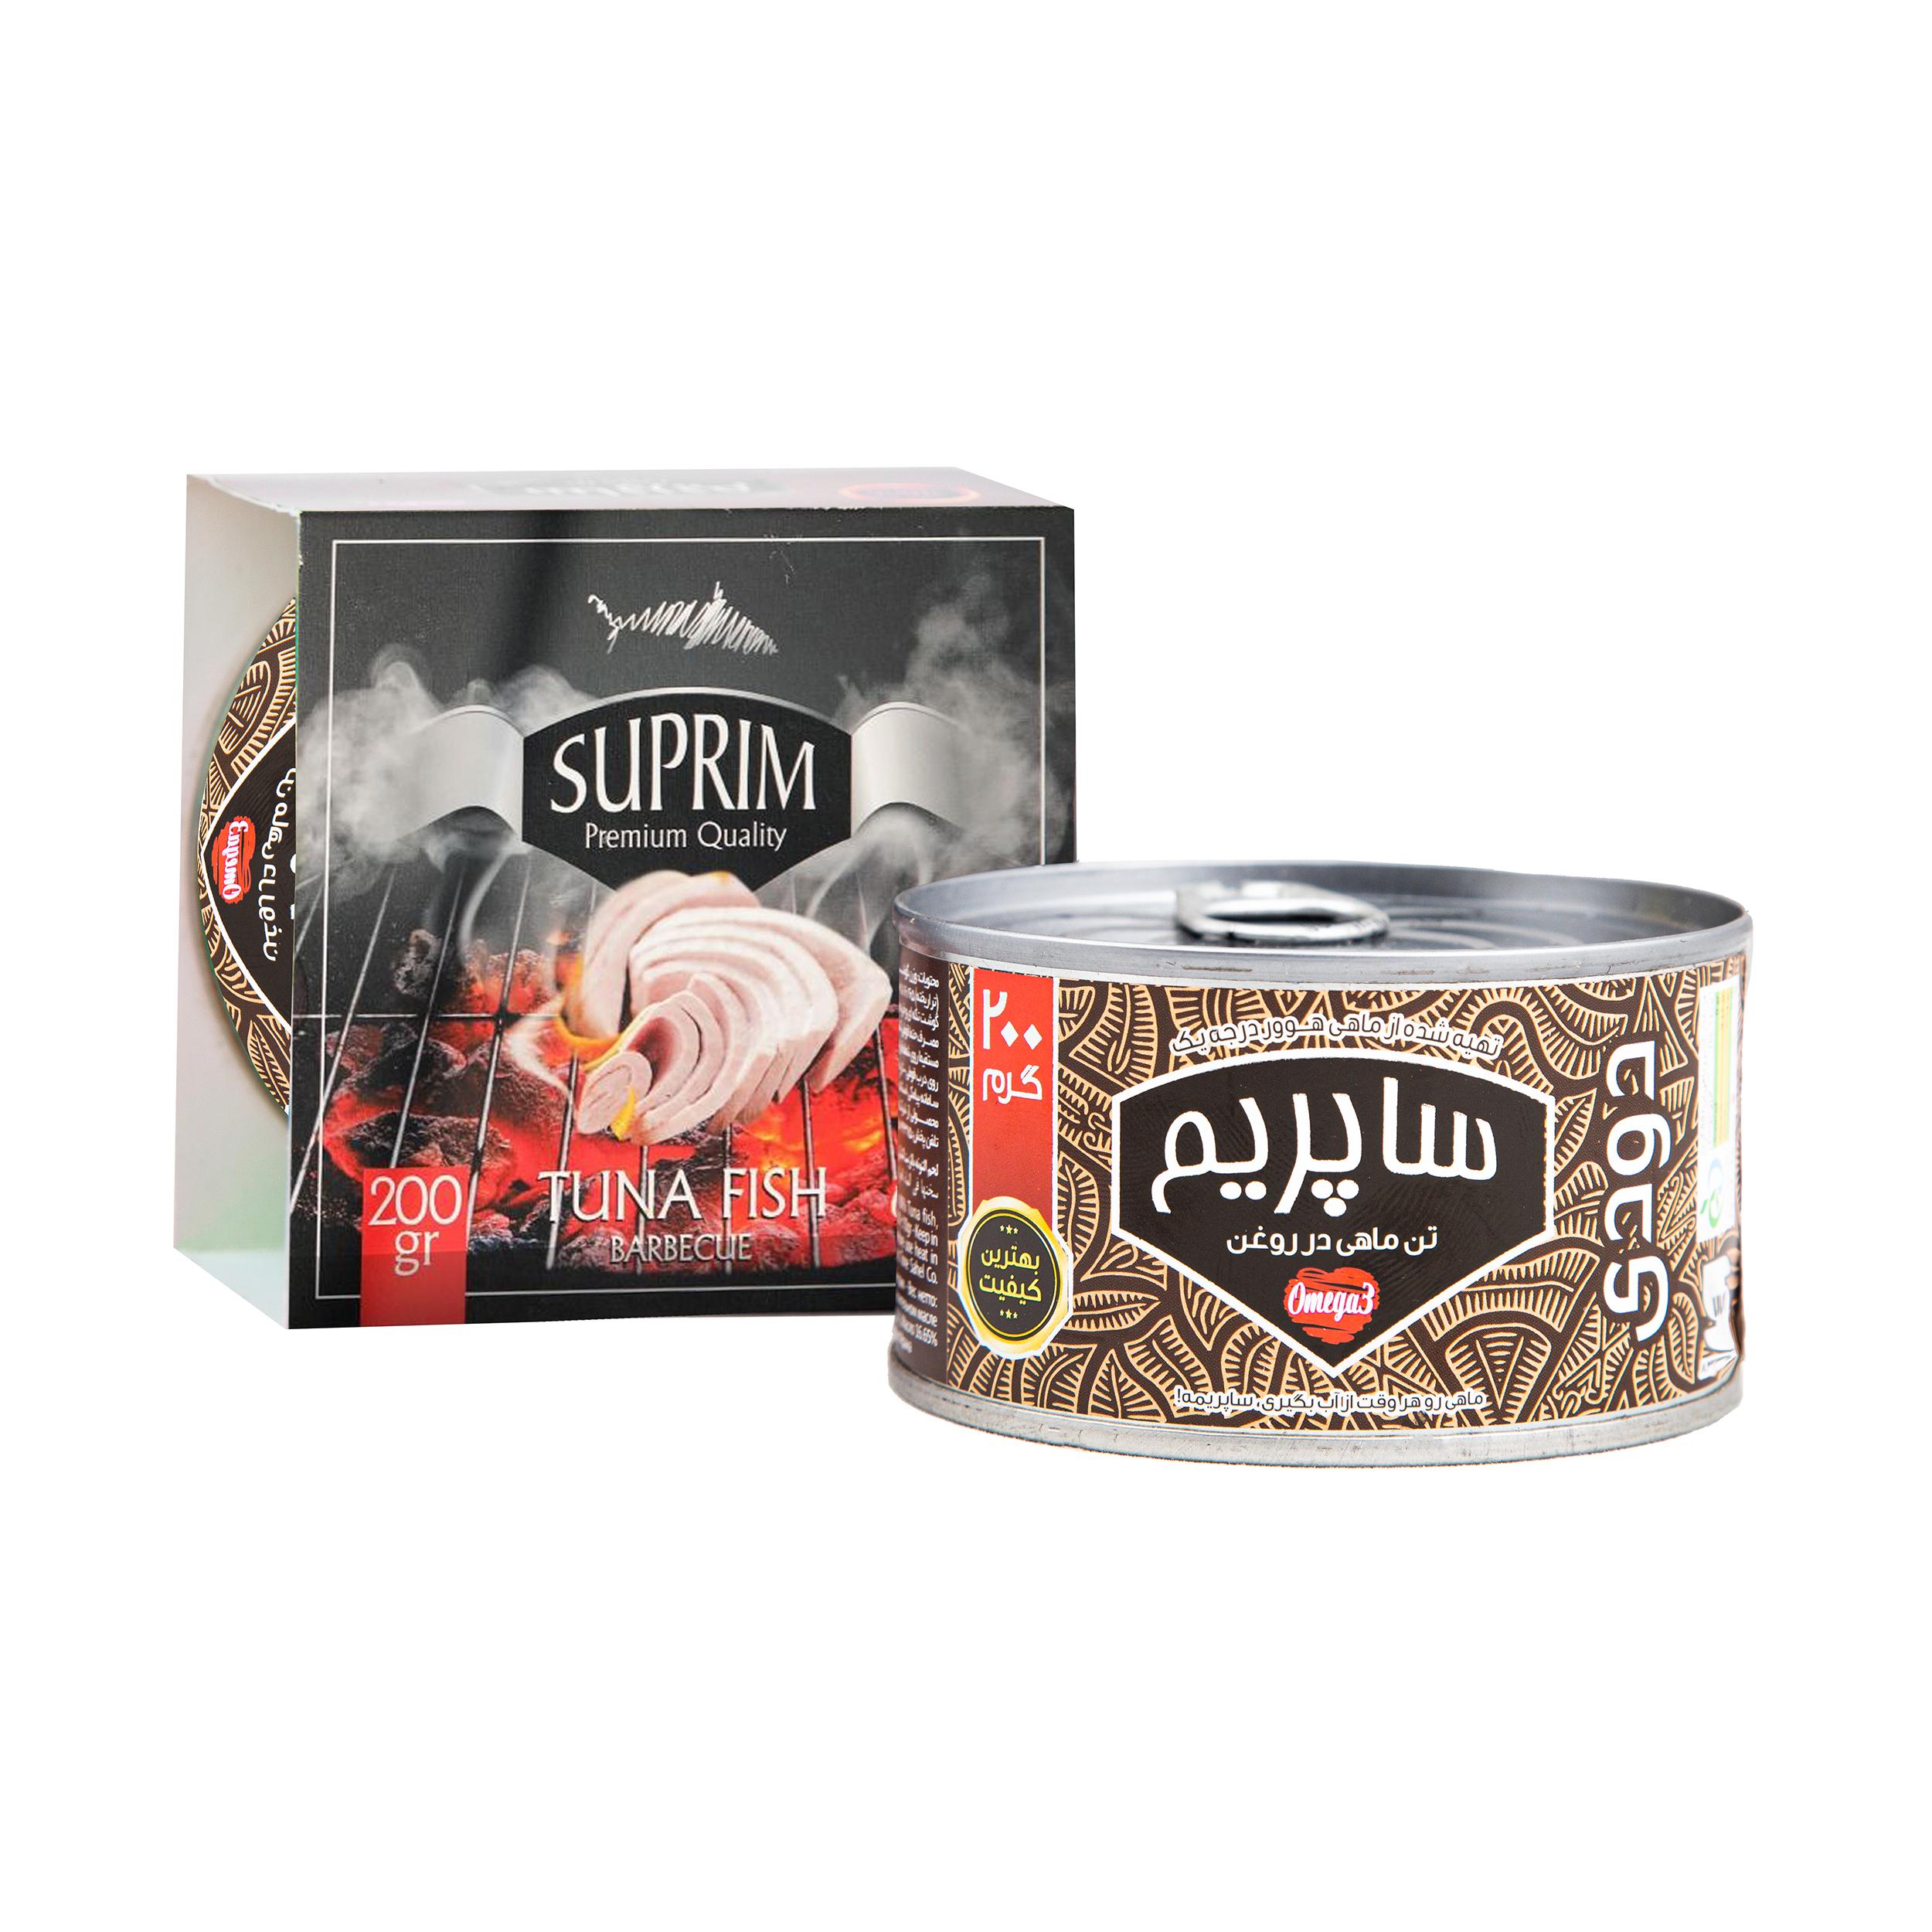 کنسرو ماهی تن دودی ساپریم - 200 گرم